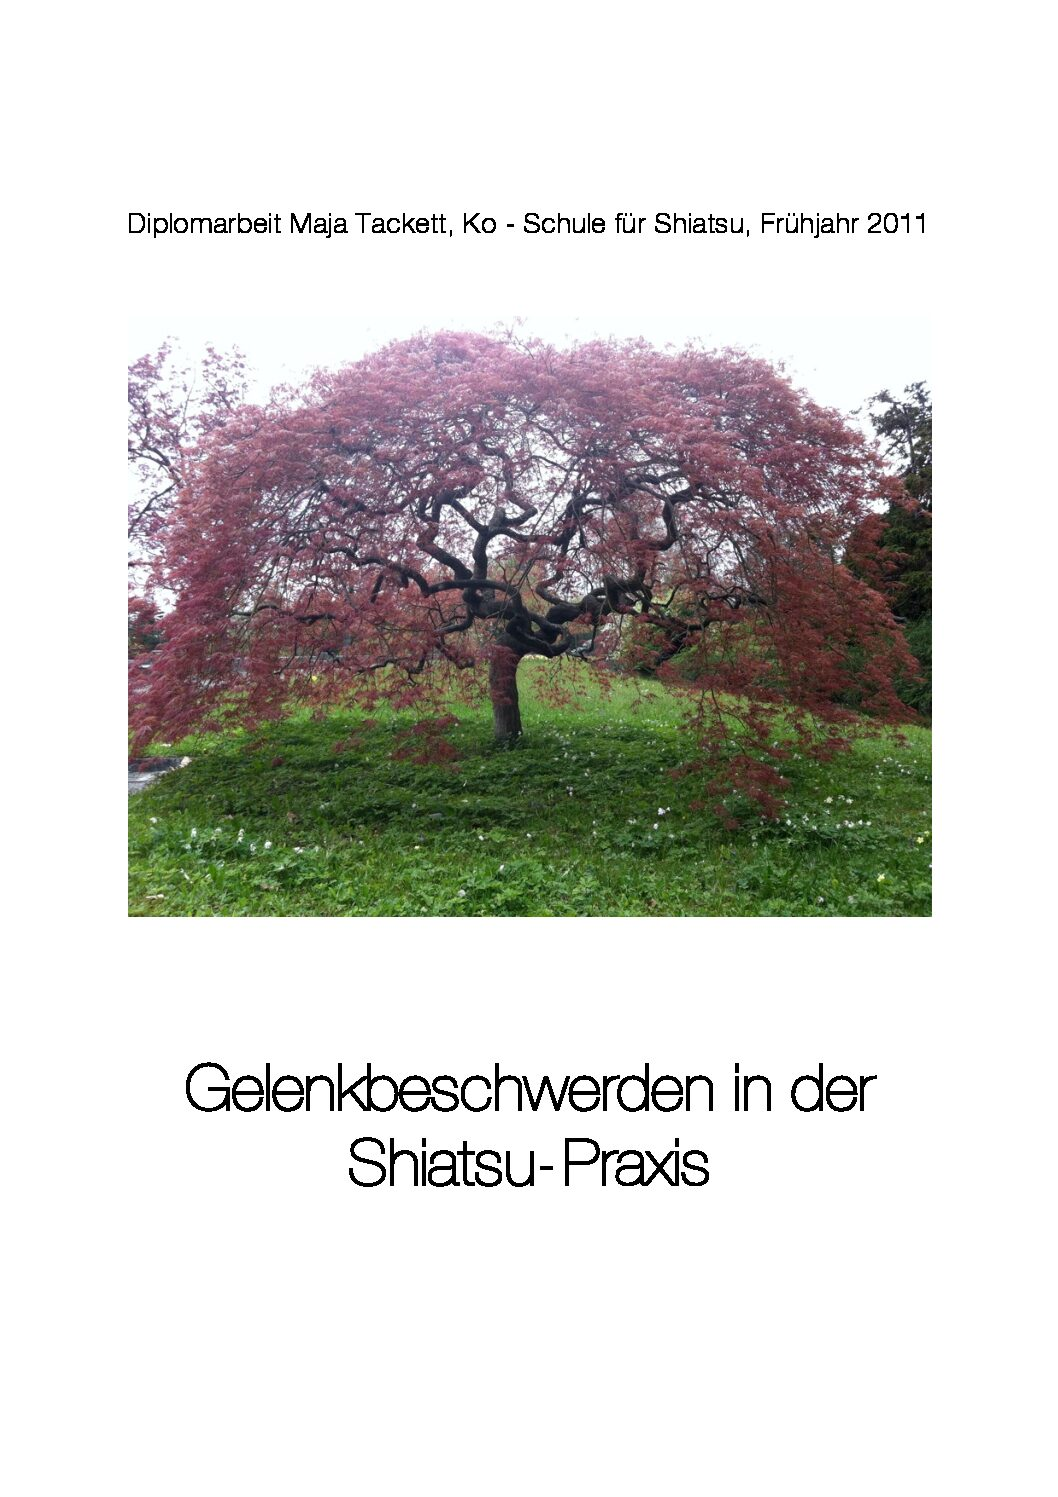 Gelenkbeschwerden in der Shiatsu-Praxis (2011, Maja Tackett)